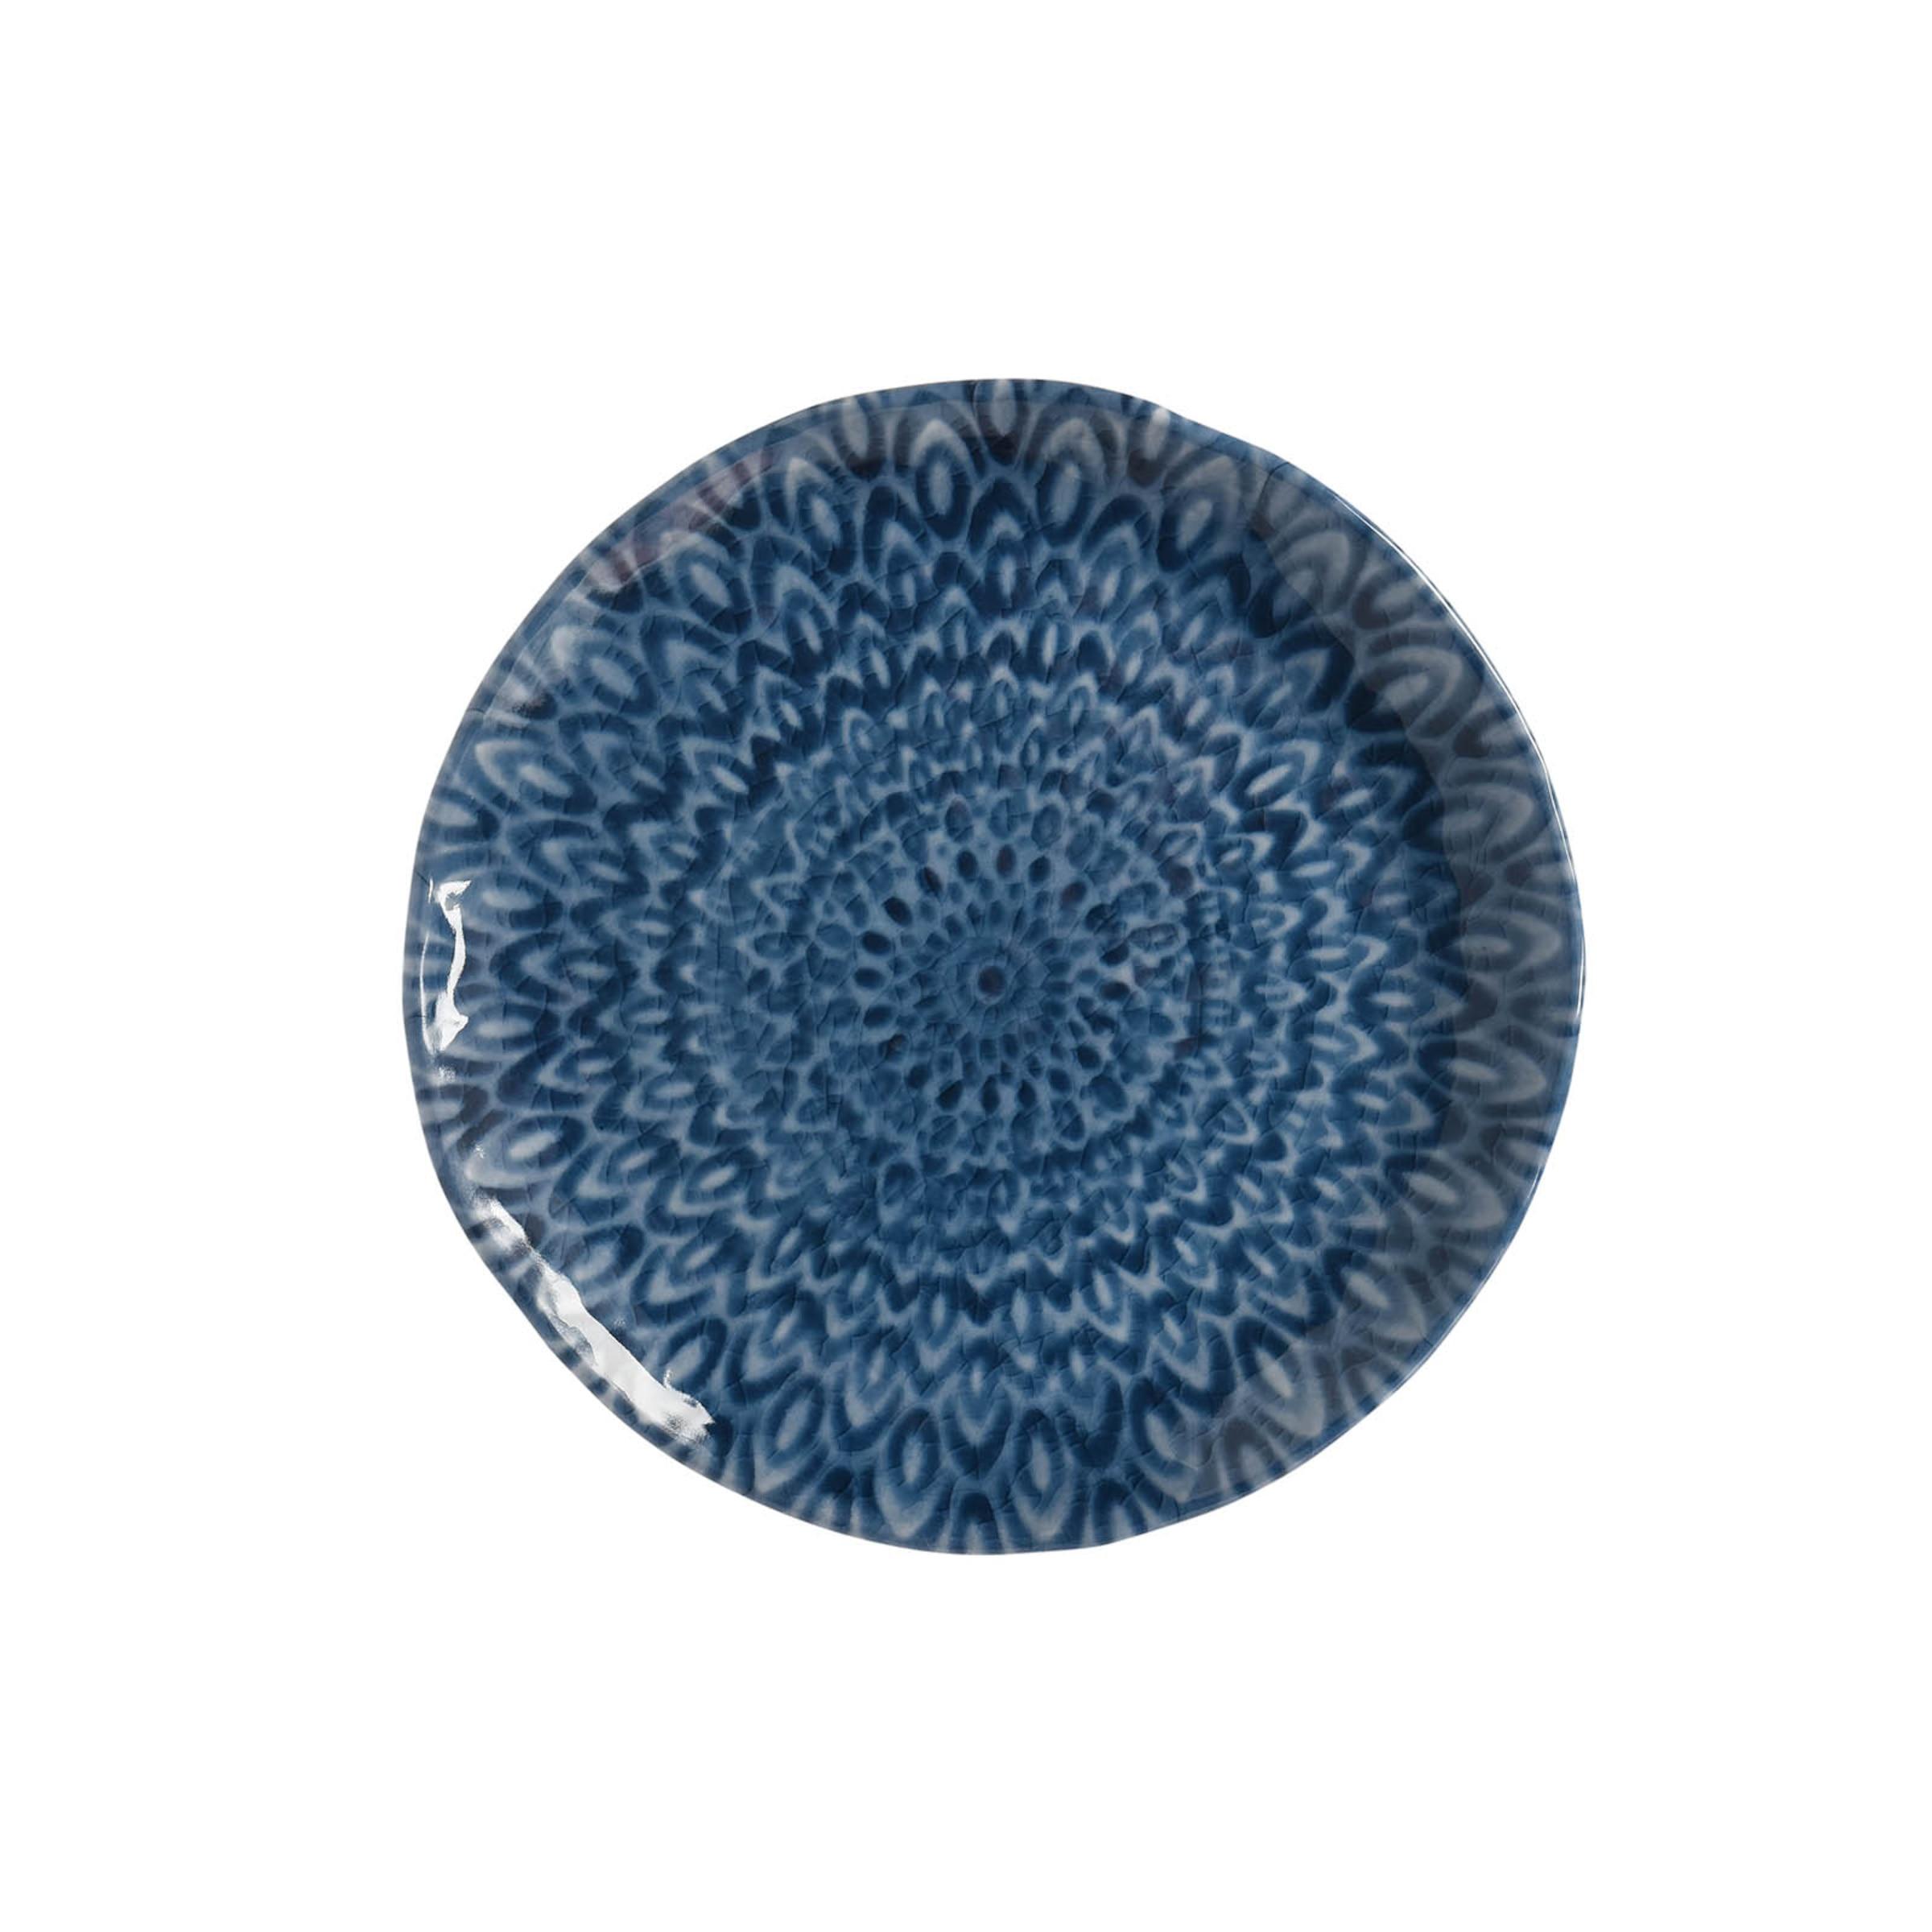 Picknick-Teller Mandala, D:21,5cm, blau